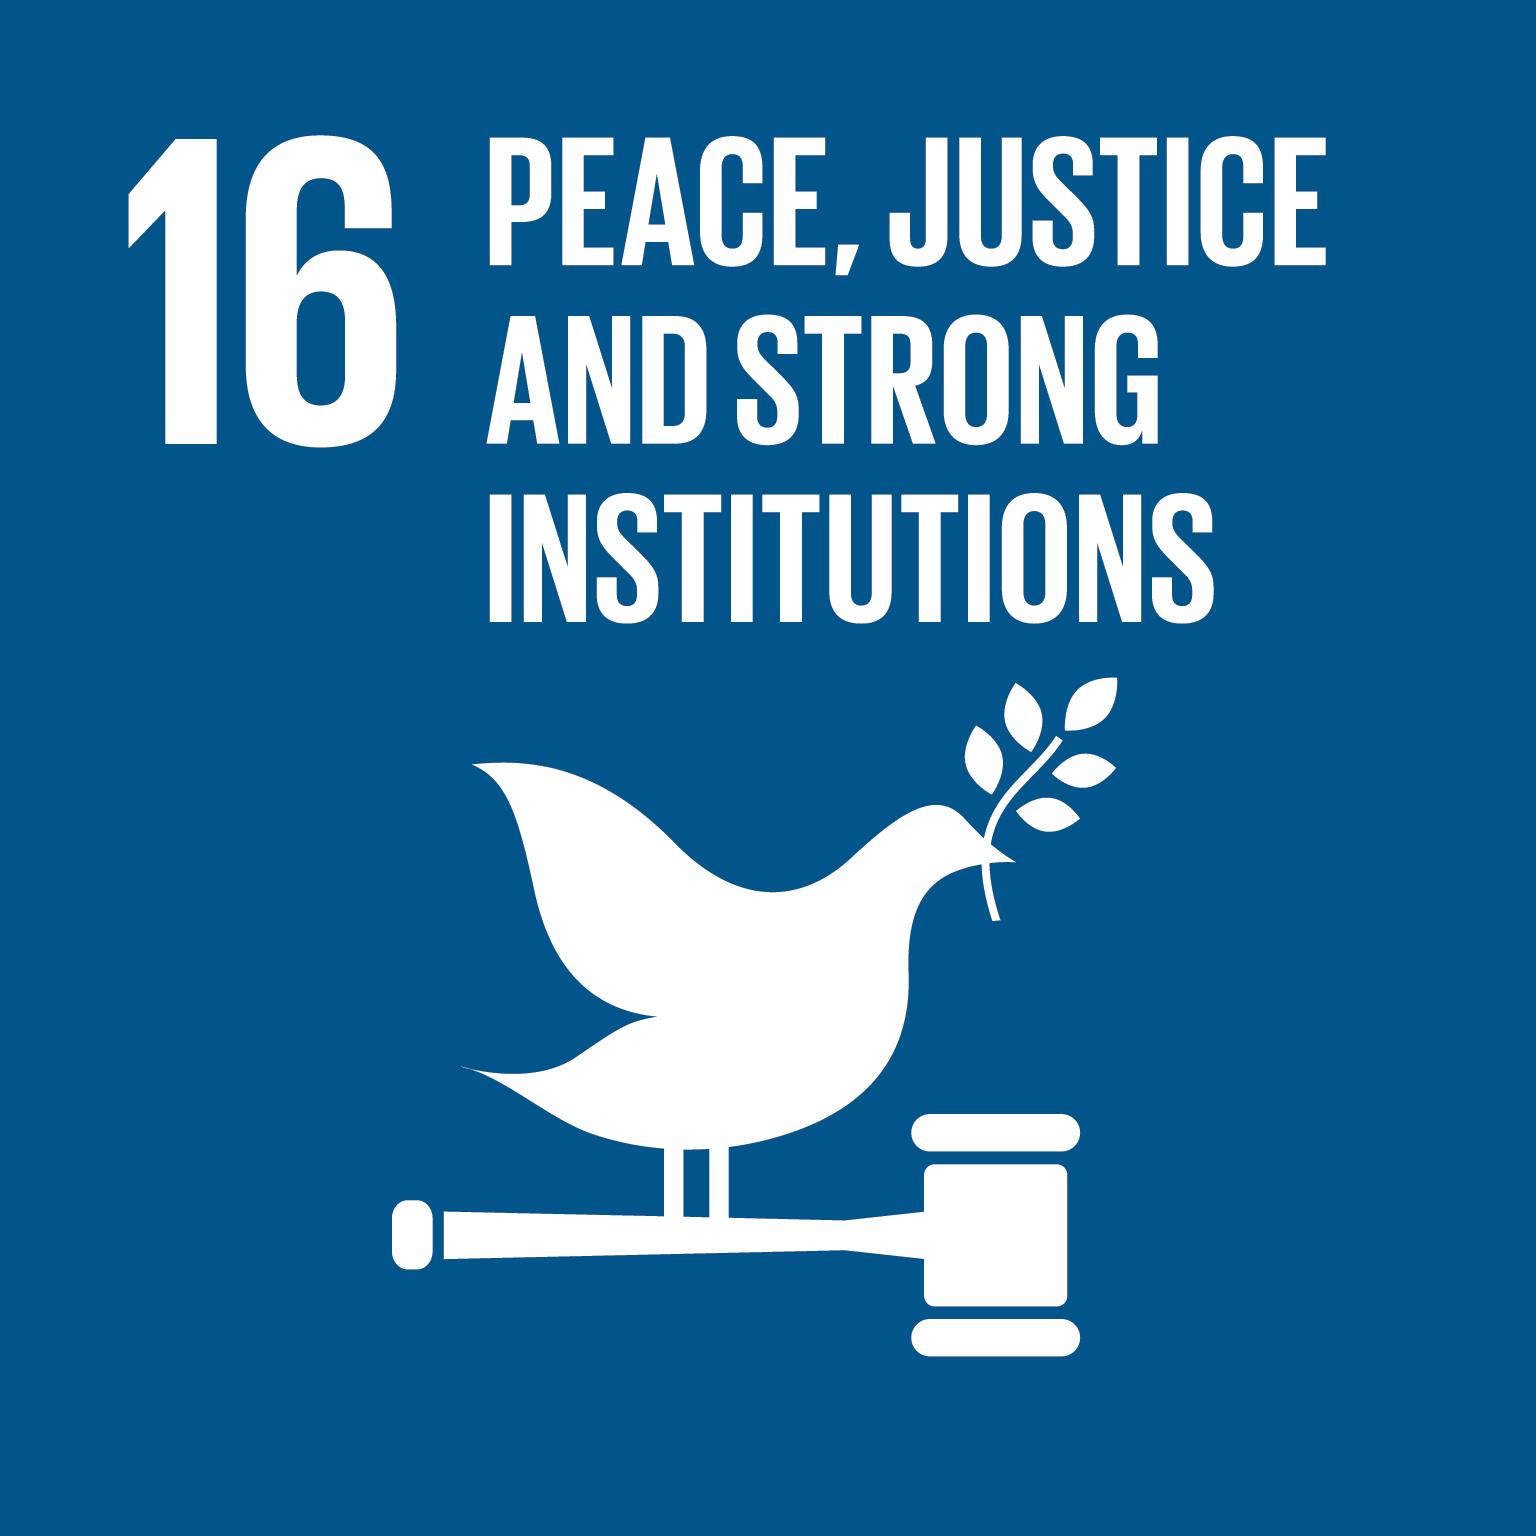 SDG, Vrede en Recht